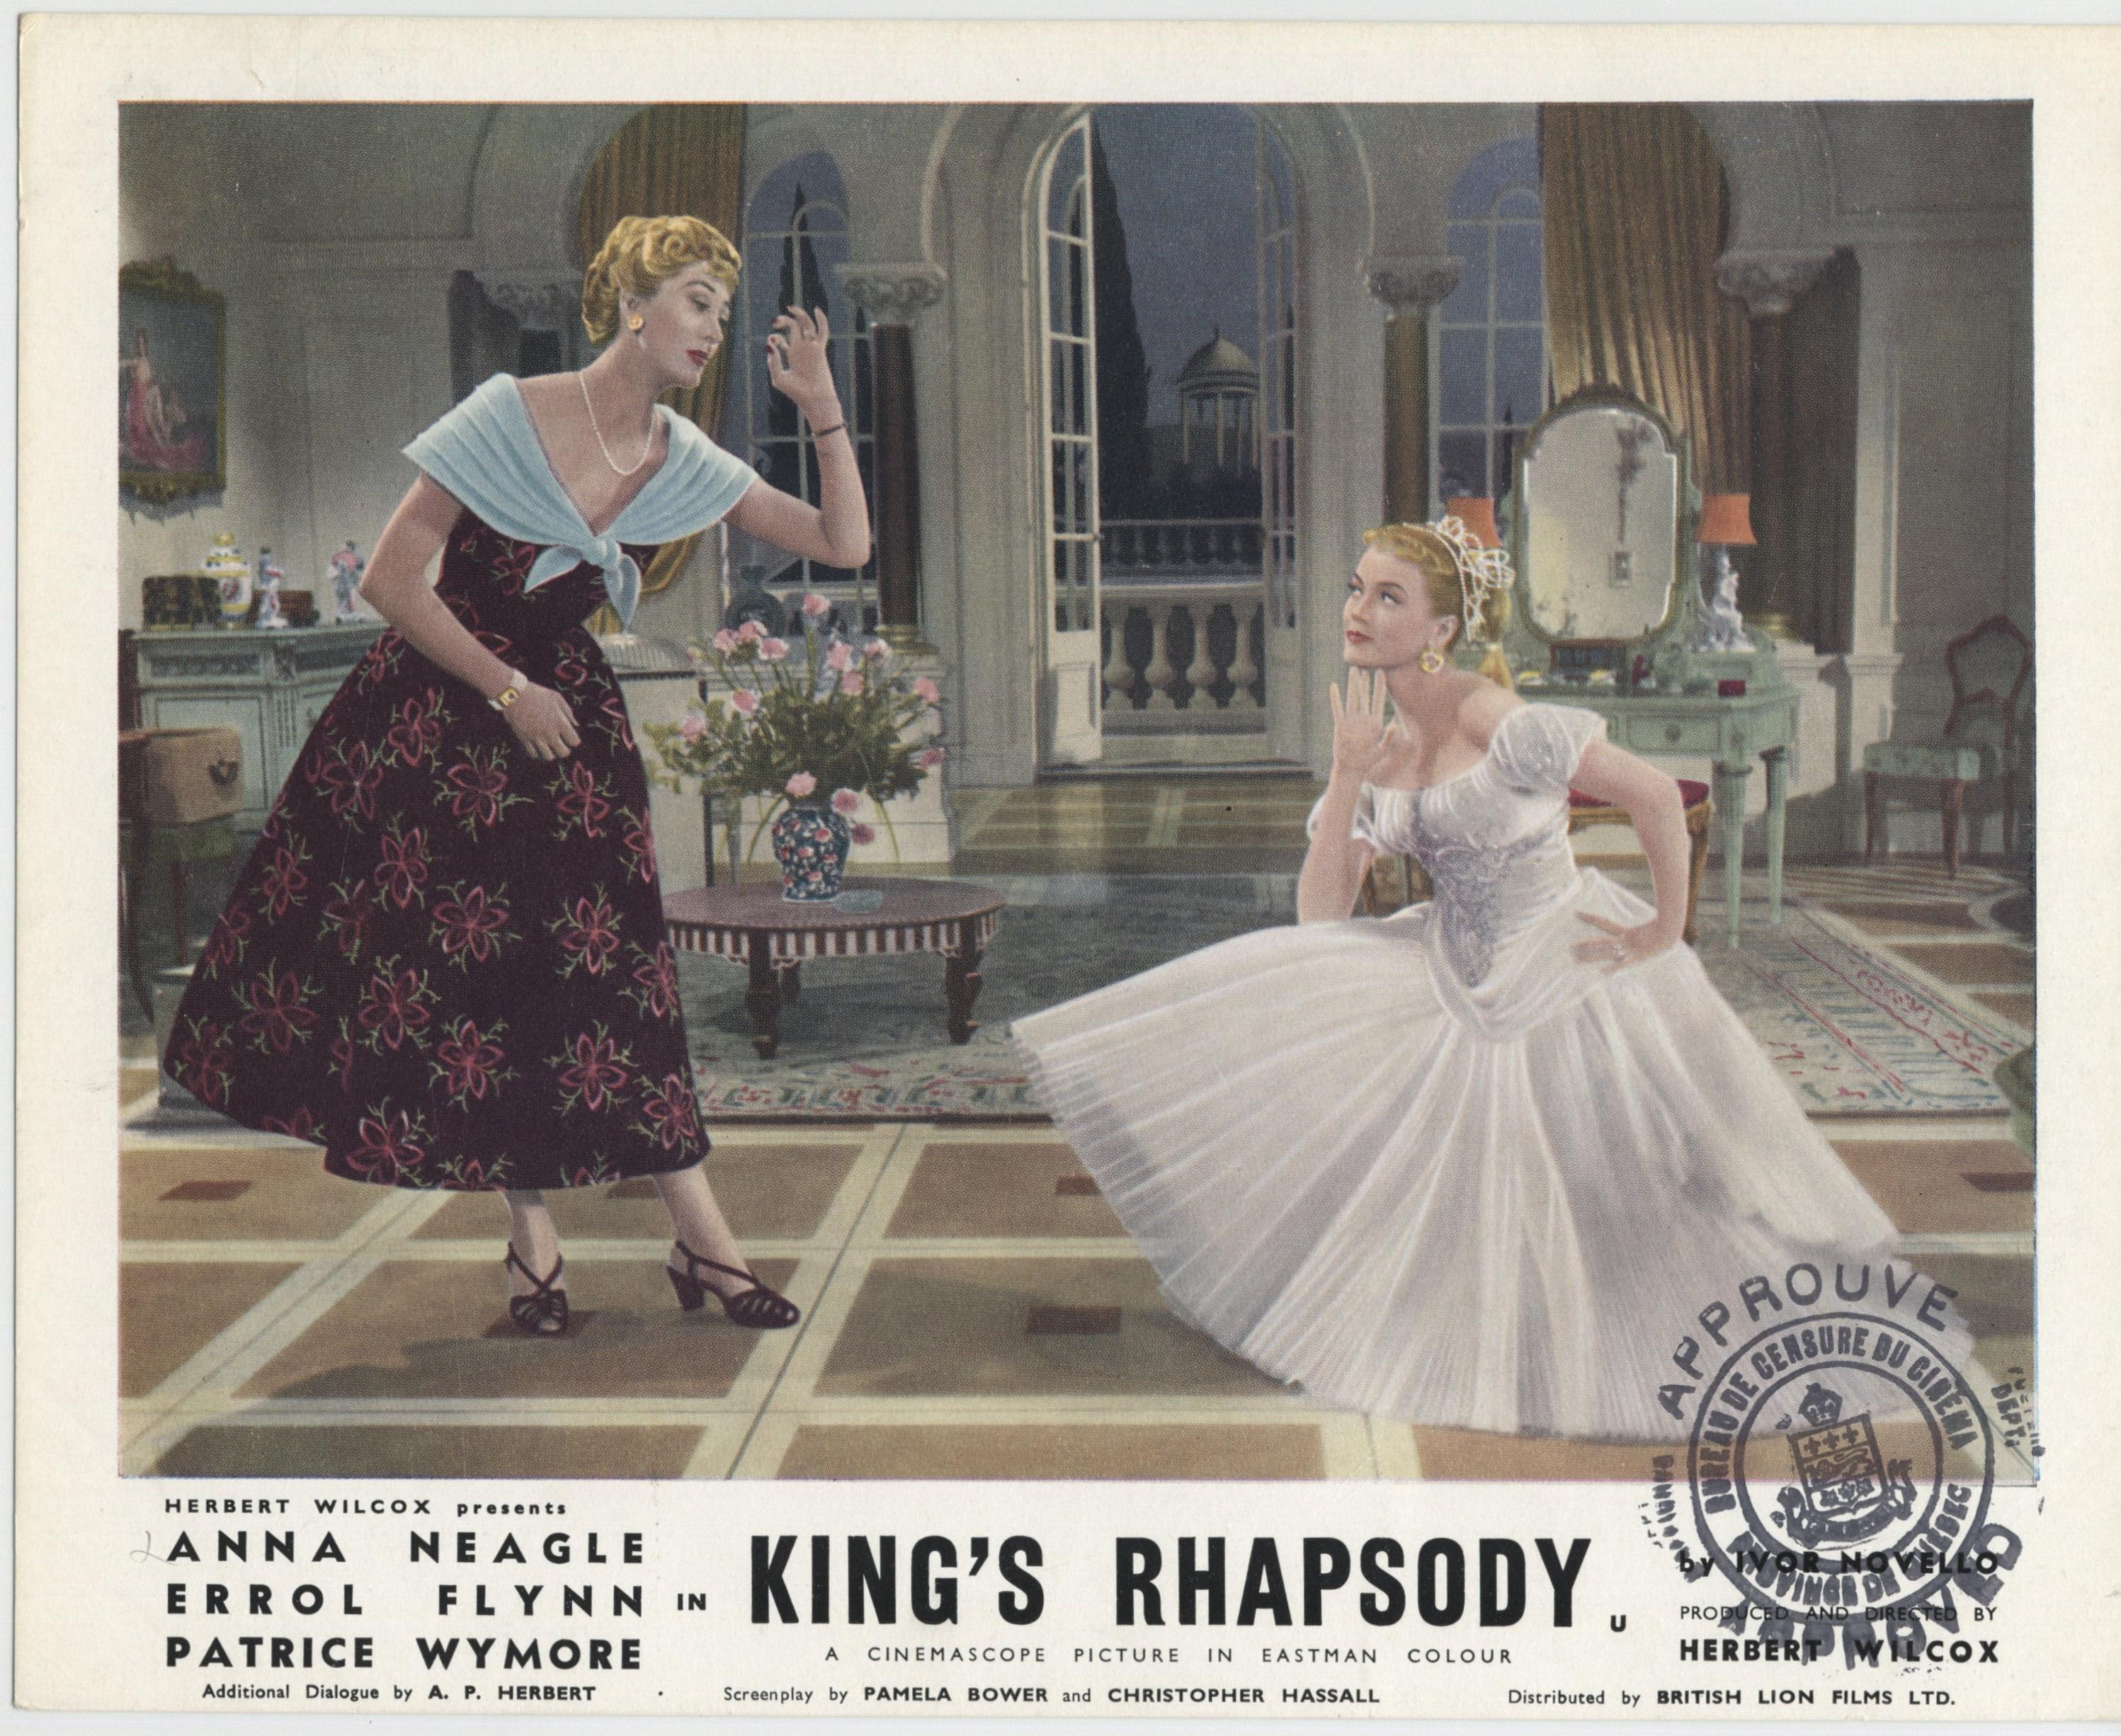 Joan Benham and Patrice Wymore in King's Rhapsody (1955)